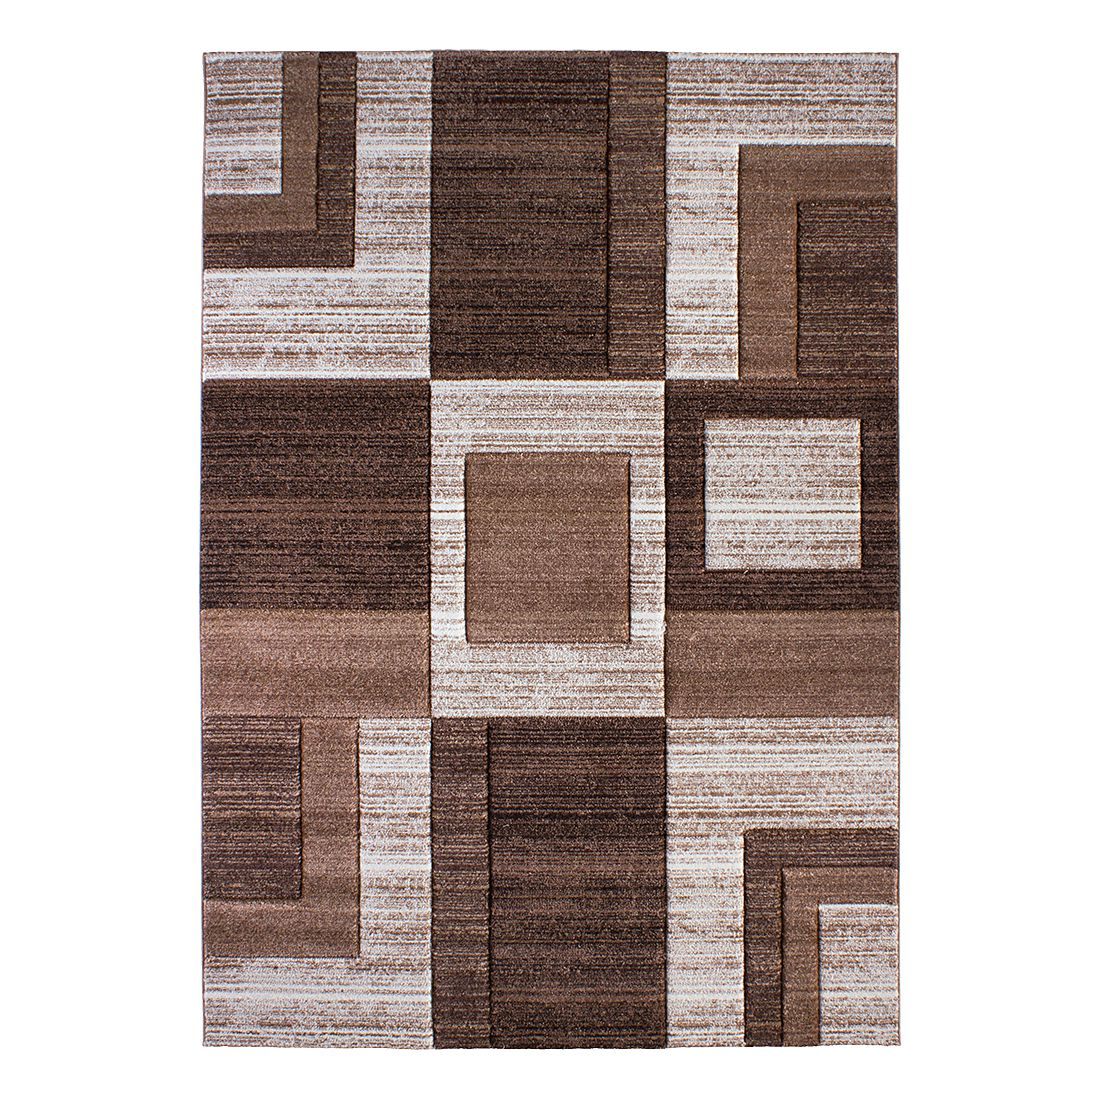 Teppich Fort Wayne I – 200 x 290 cm, andiamo günstig